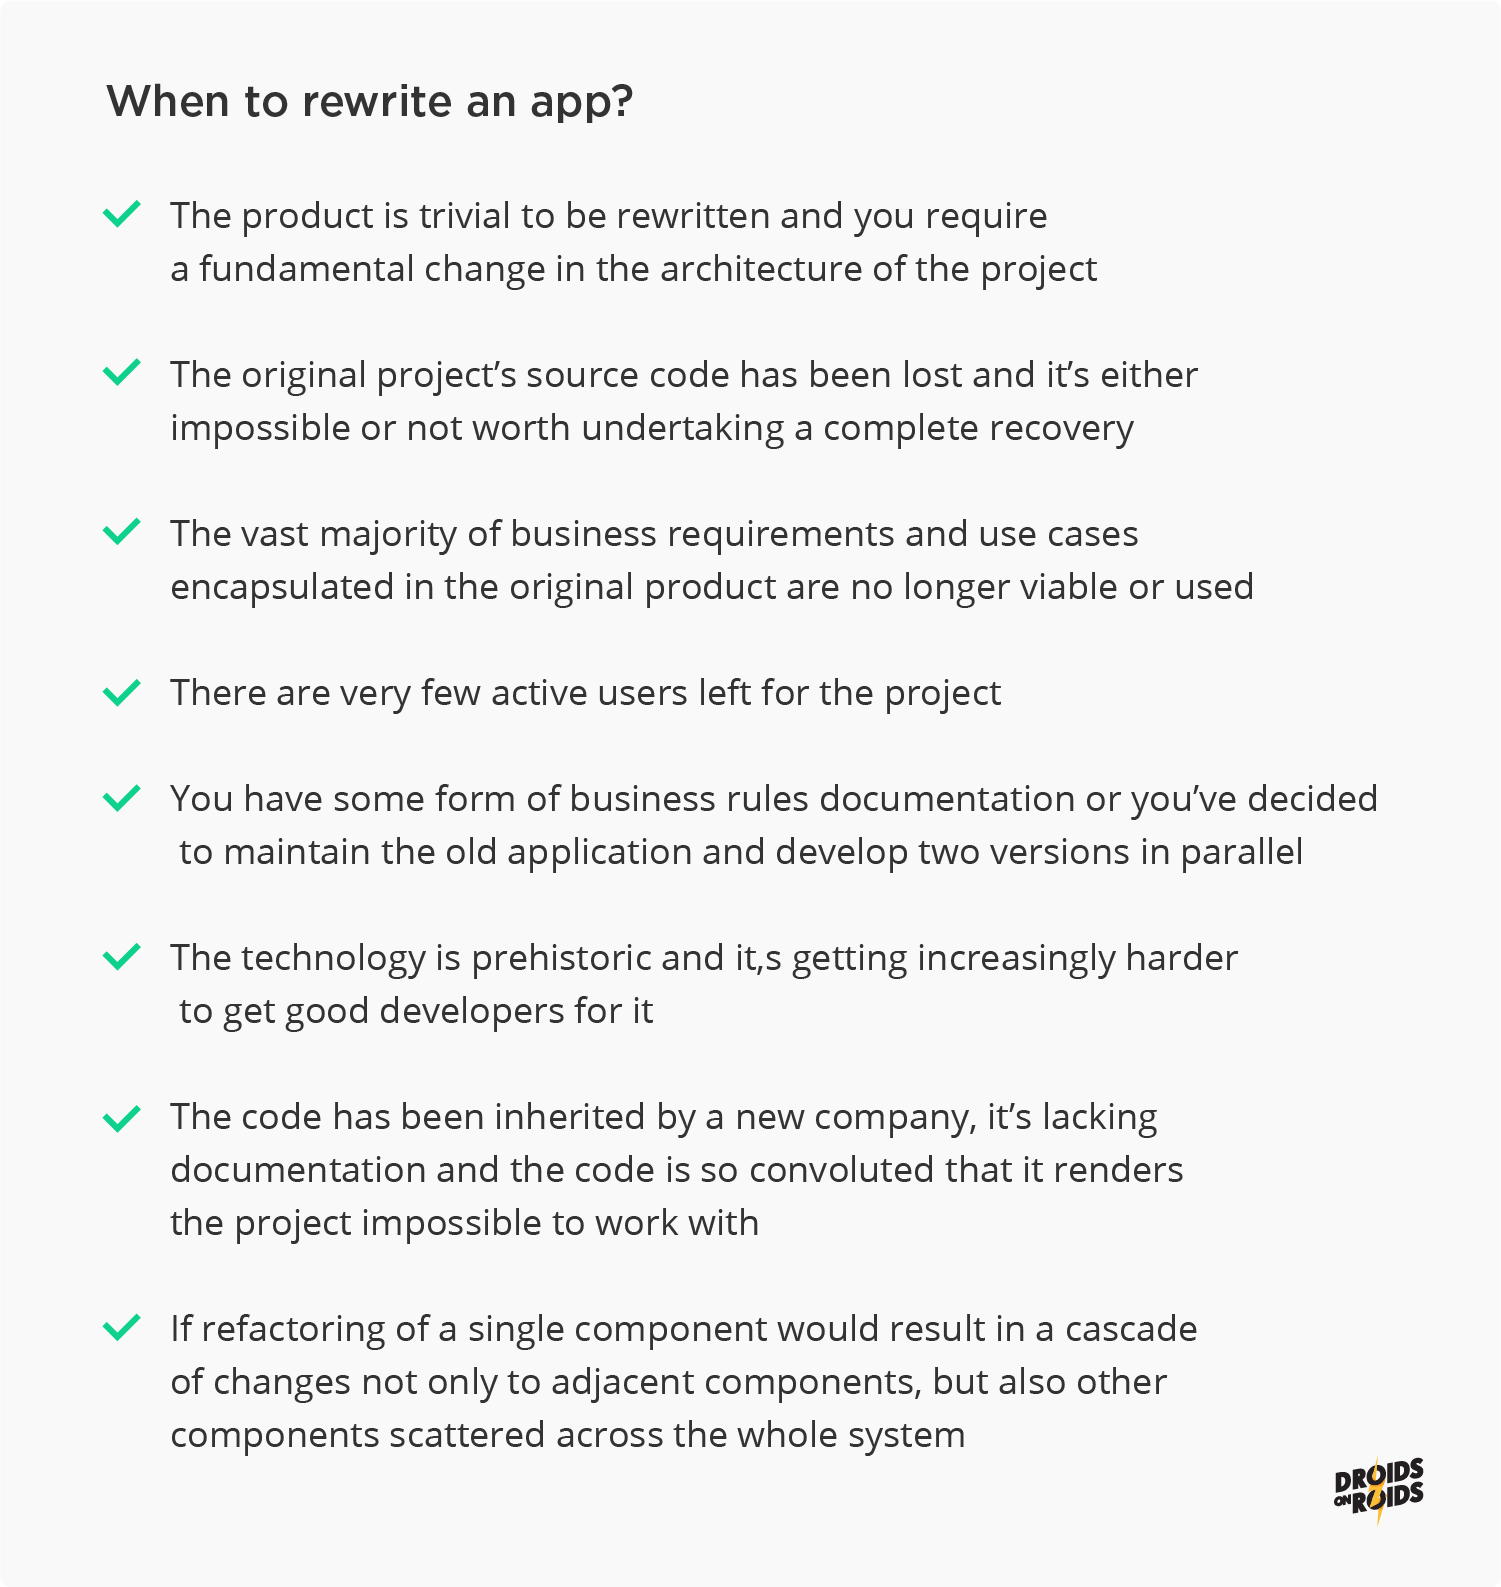 App rewriting vs refactor